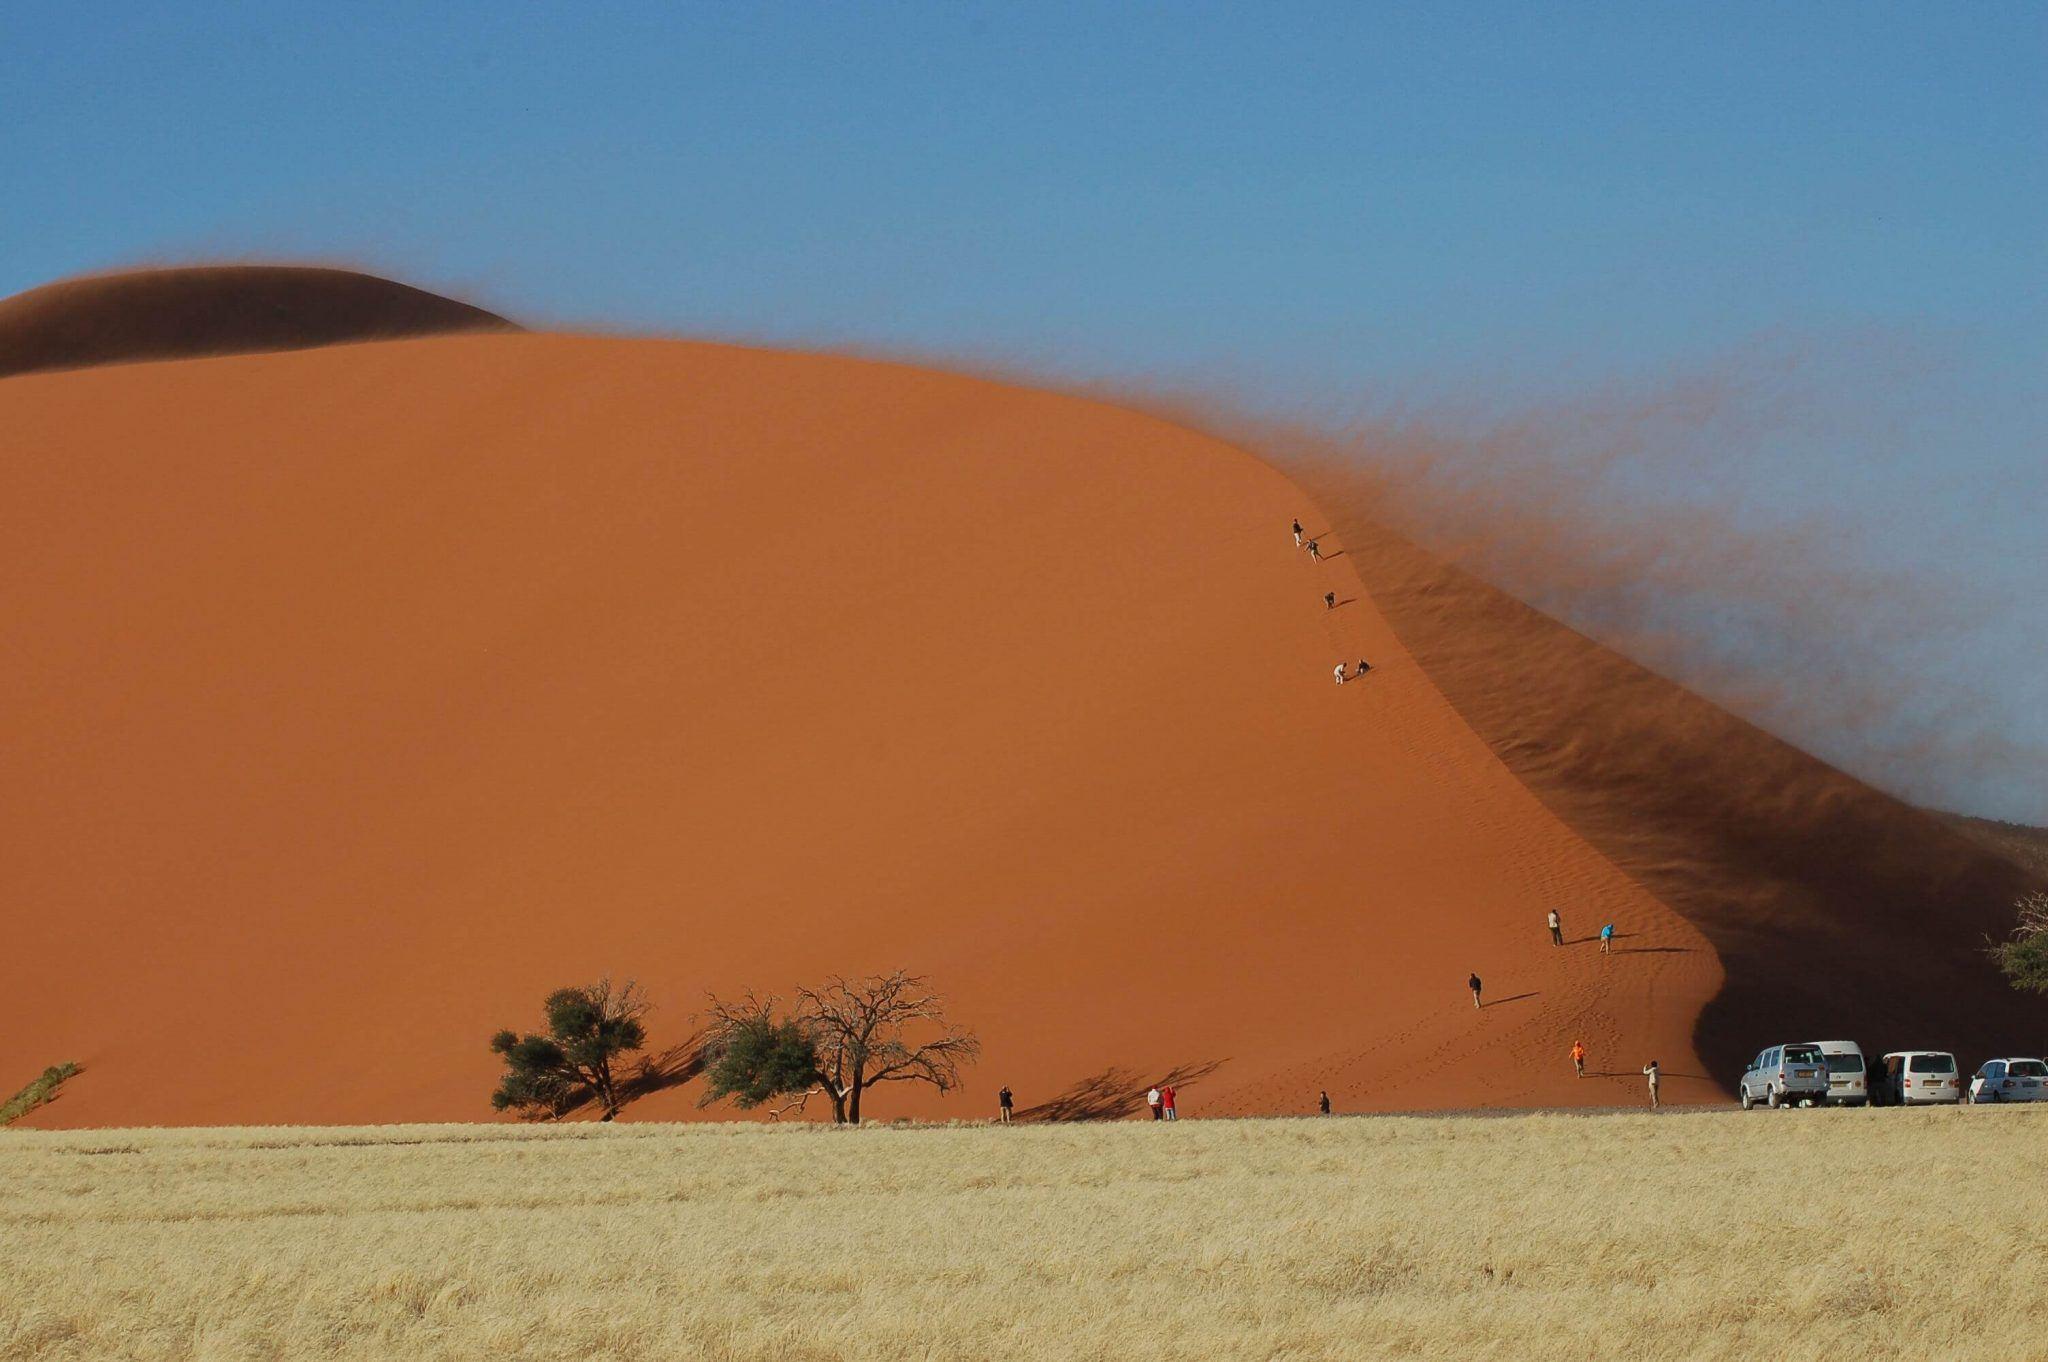 Sossusvlei Namibia travel guide photos